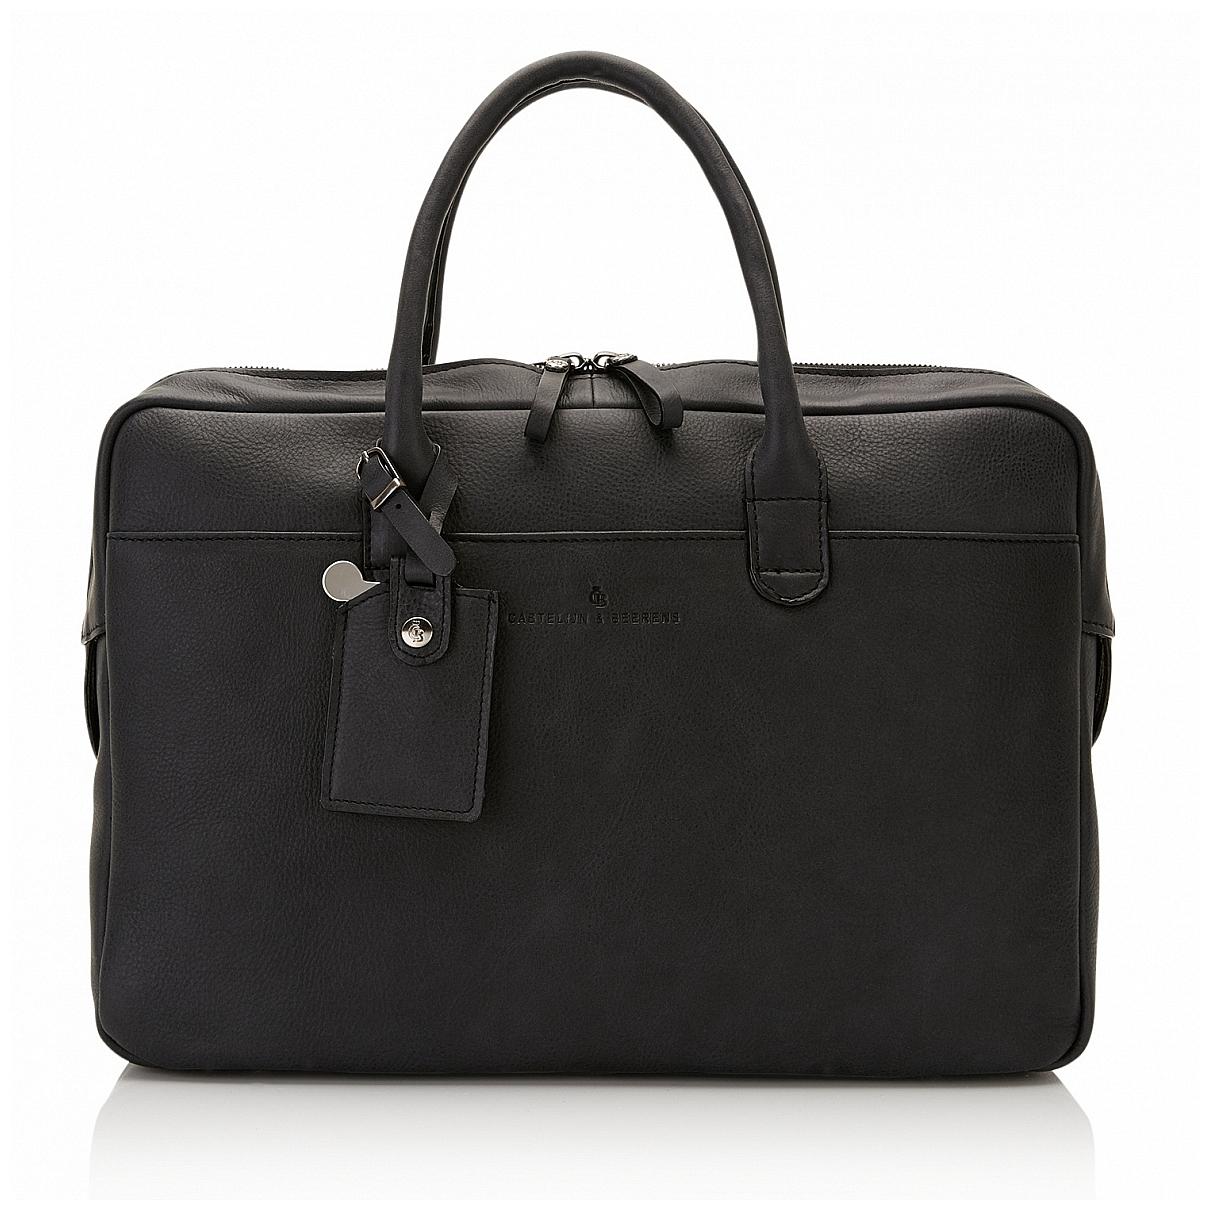 Castelijn & Beerens Kožená taška na notebook a tablet 729478 ZW černá